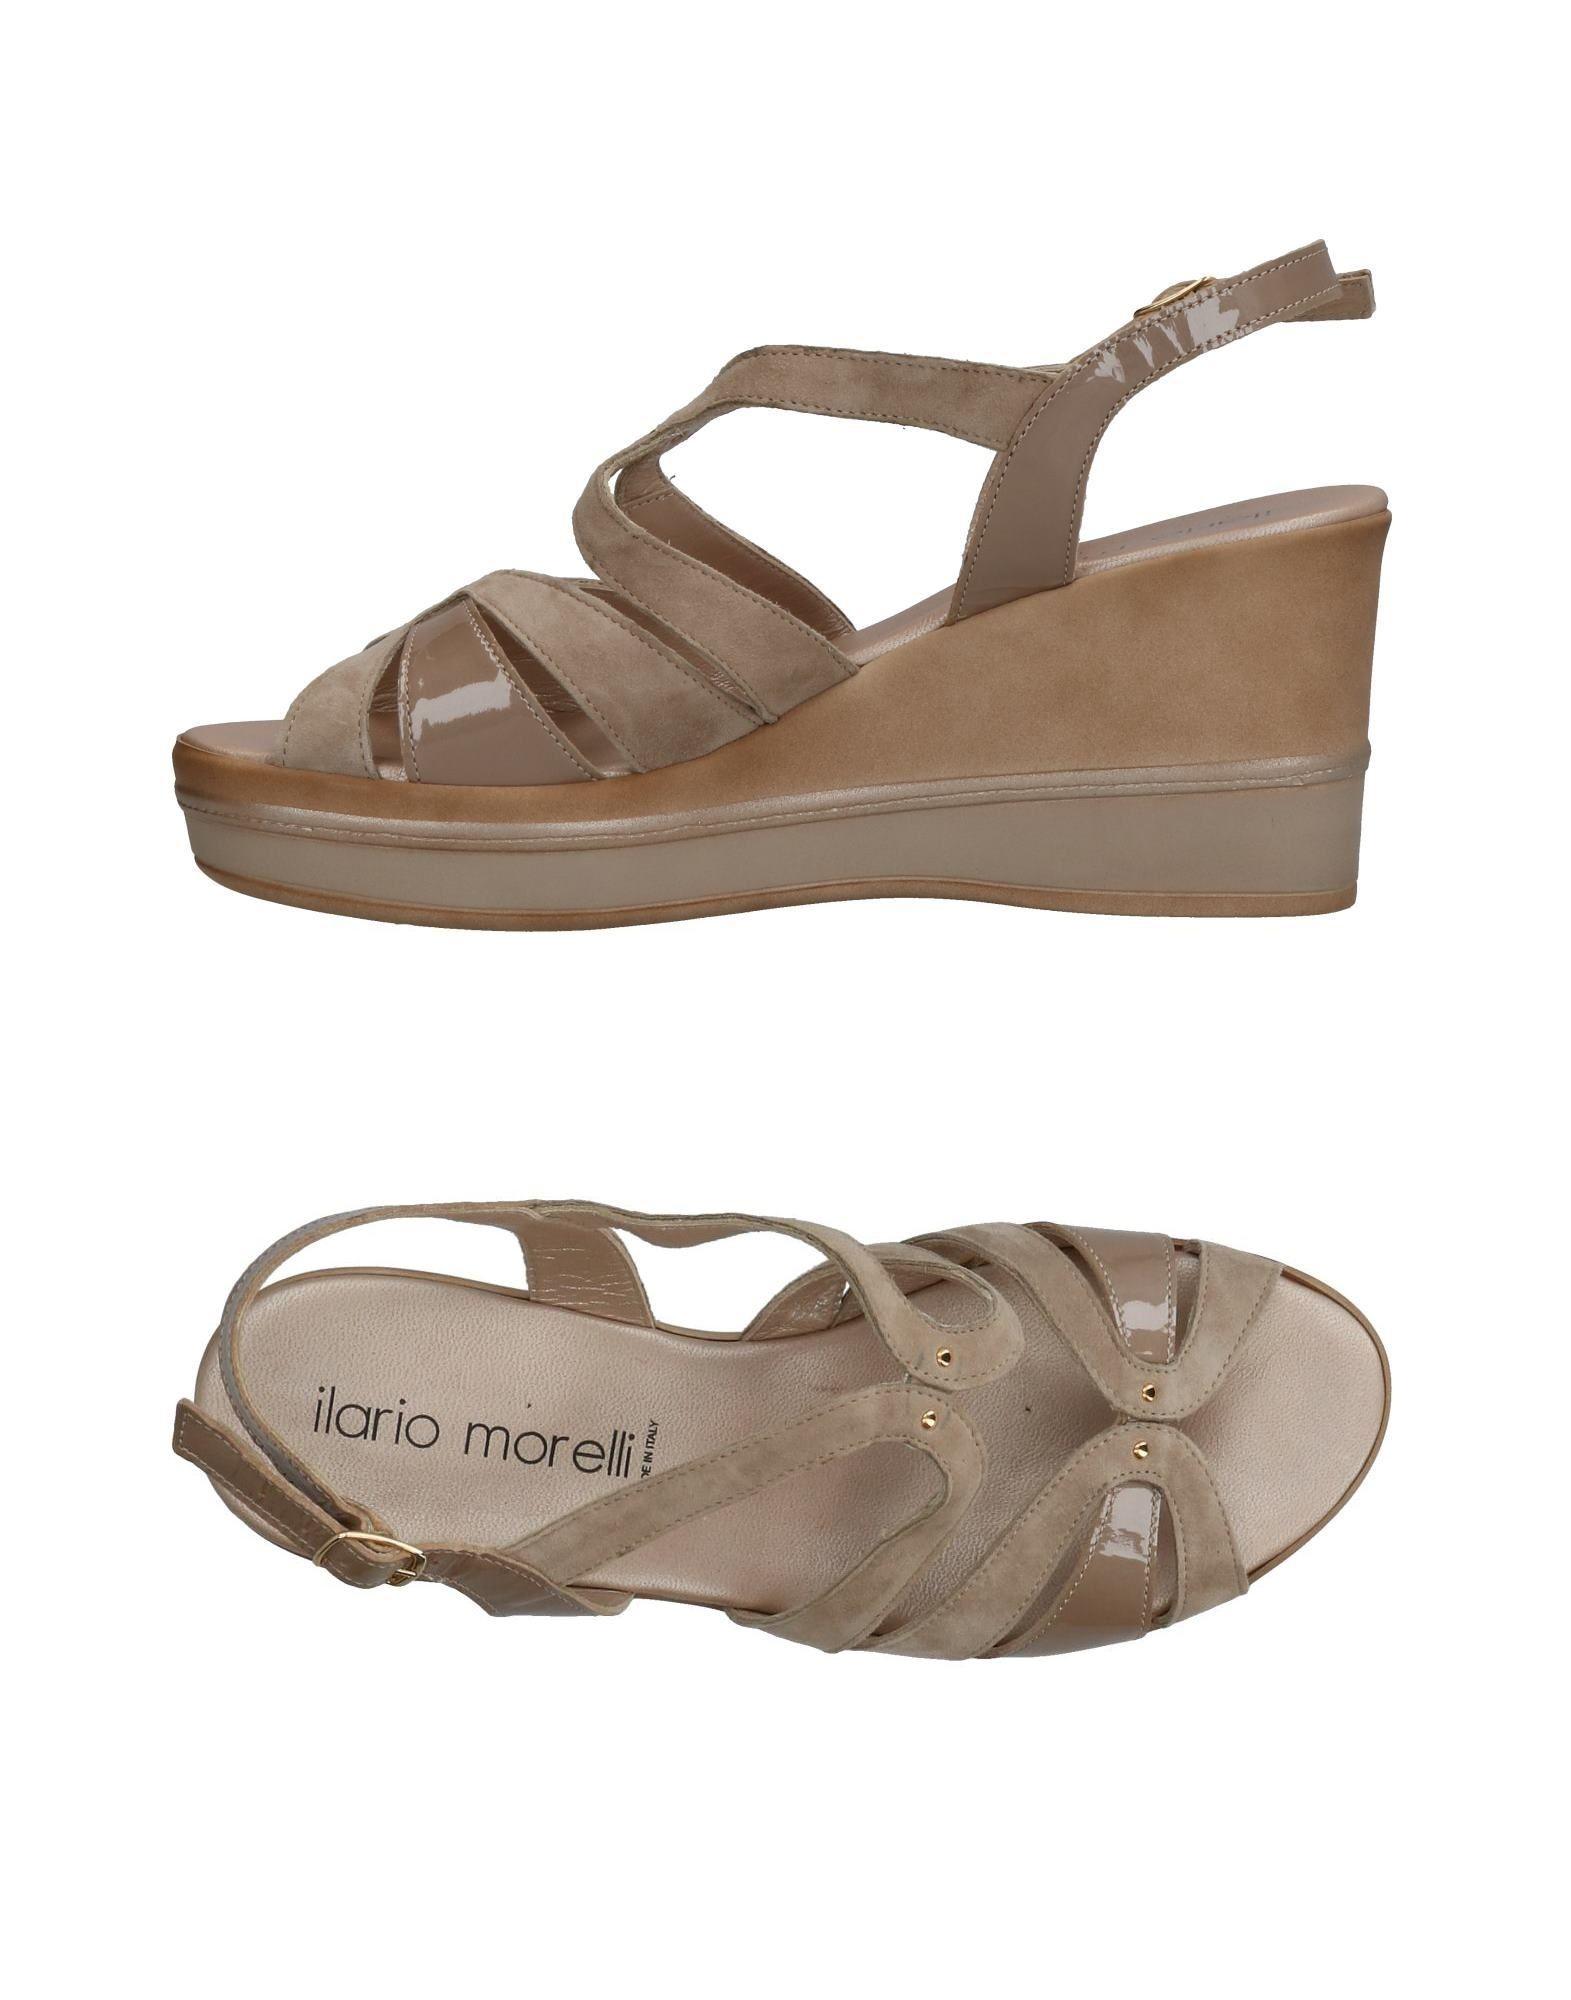 Sandales Ilario Morelli Femme - Sandales Ilario Morelli sur